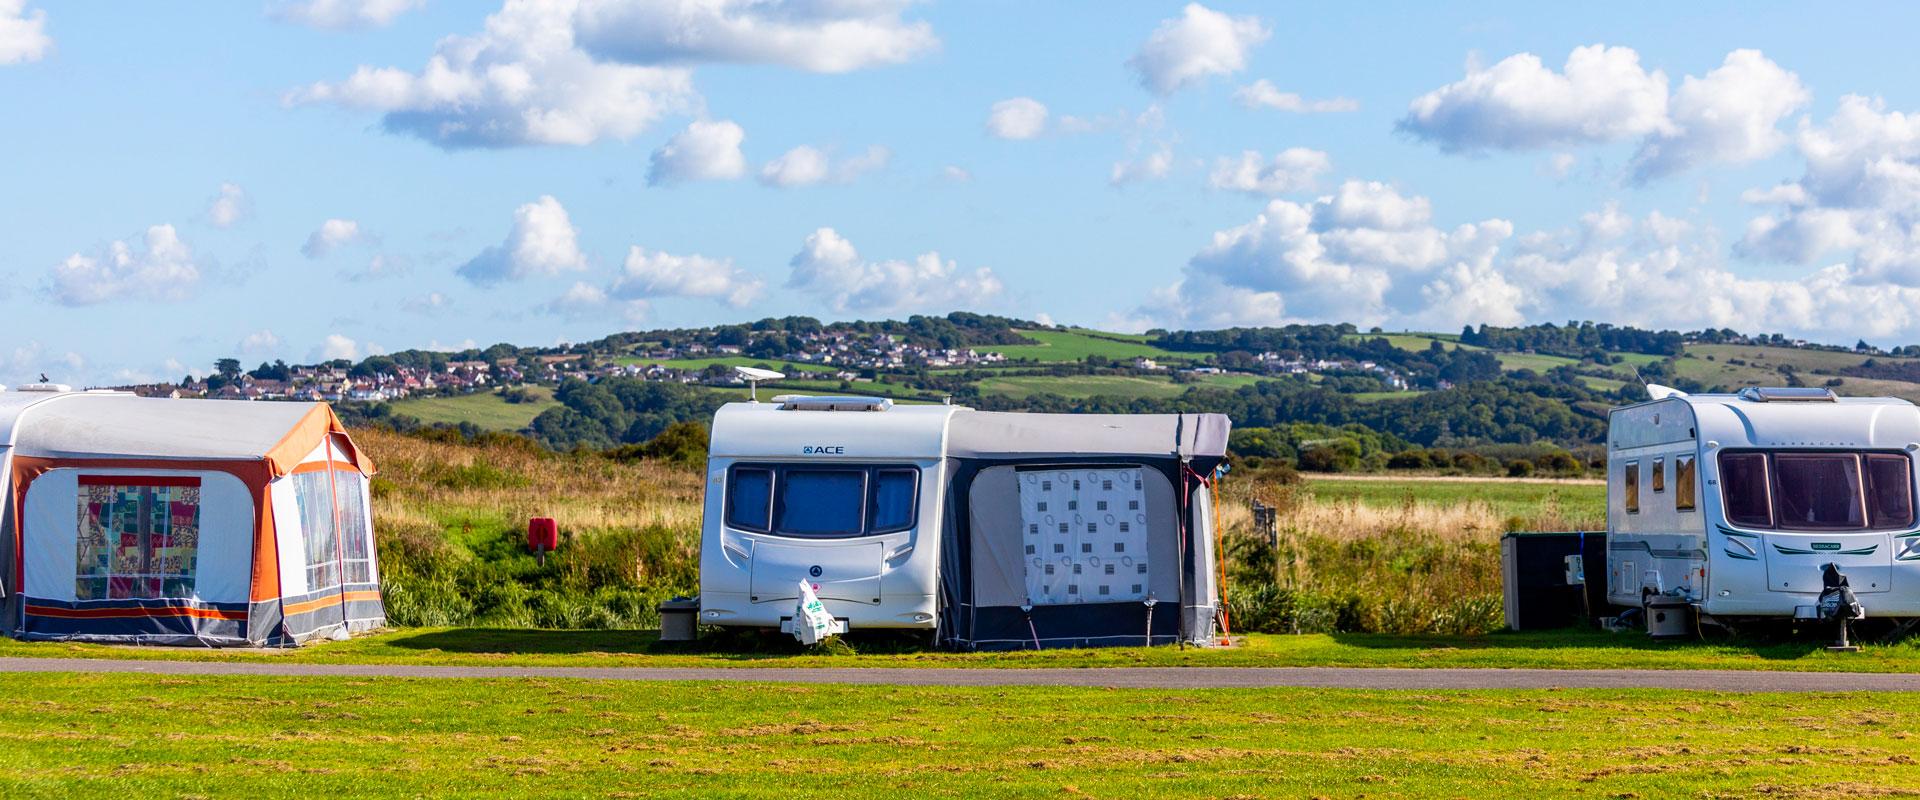 Diamond-Farm-Caravan-Camping-Uphil